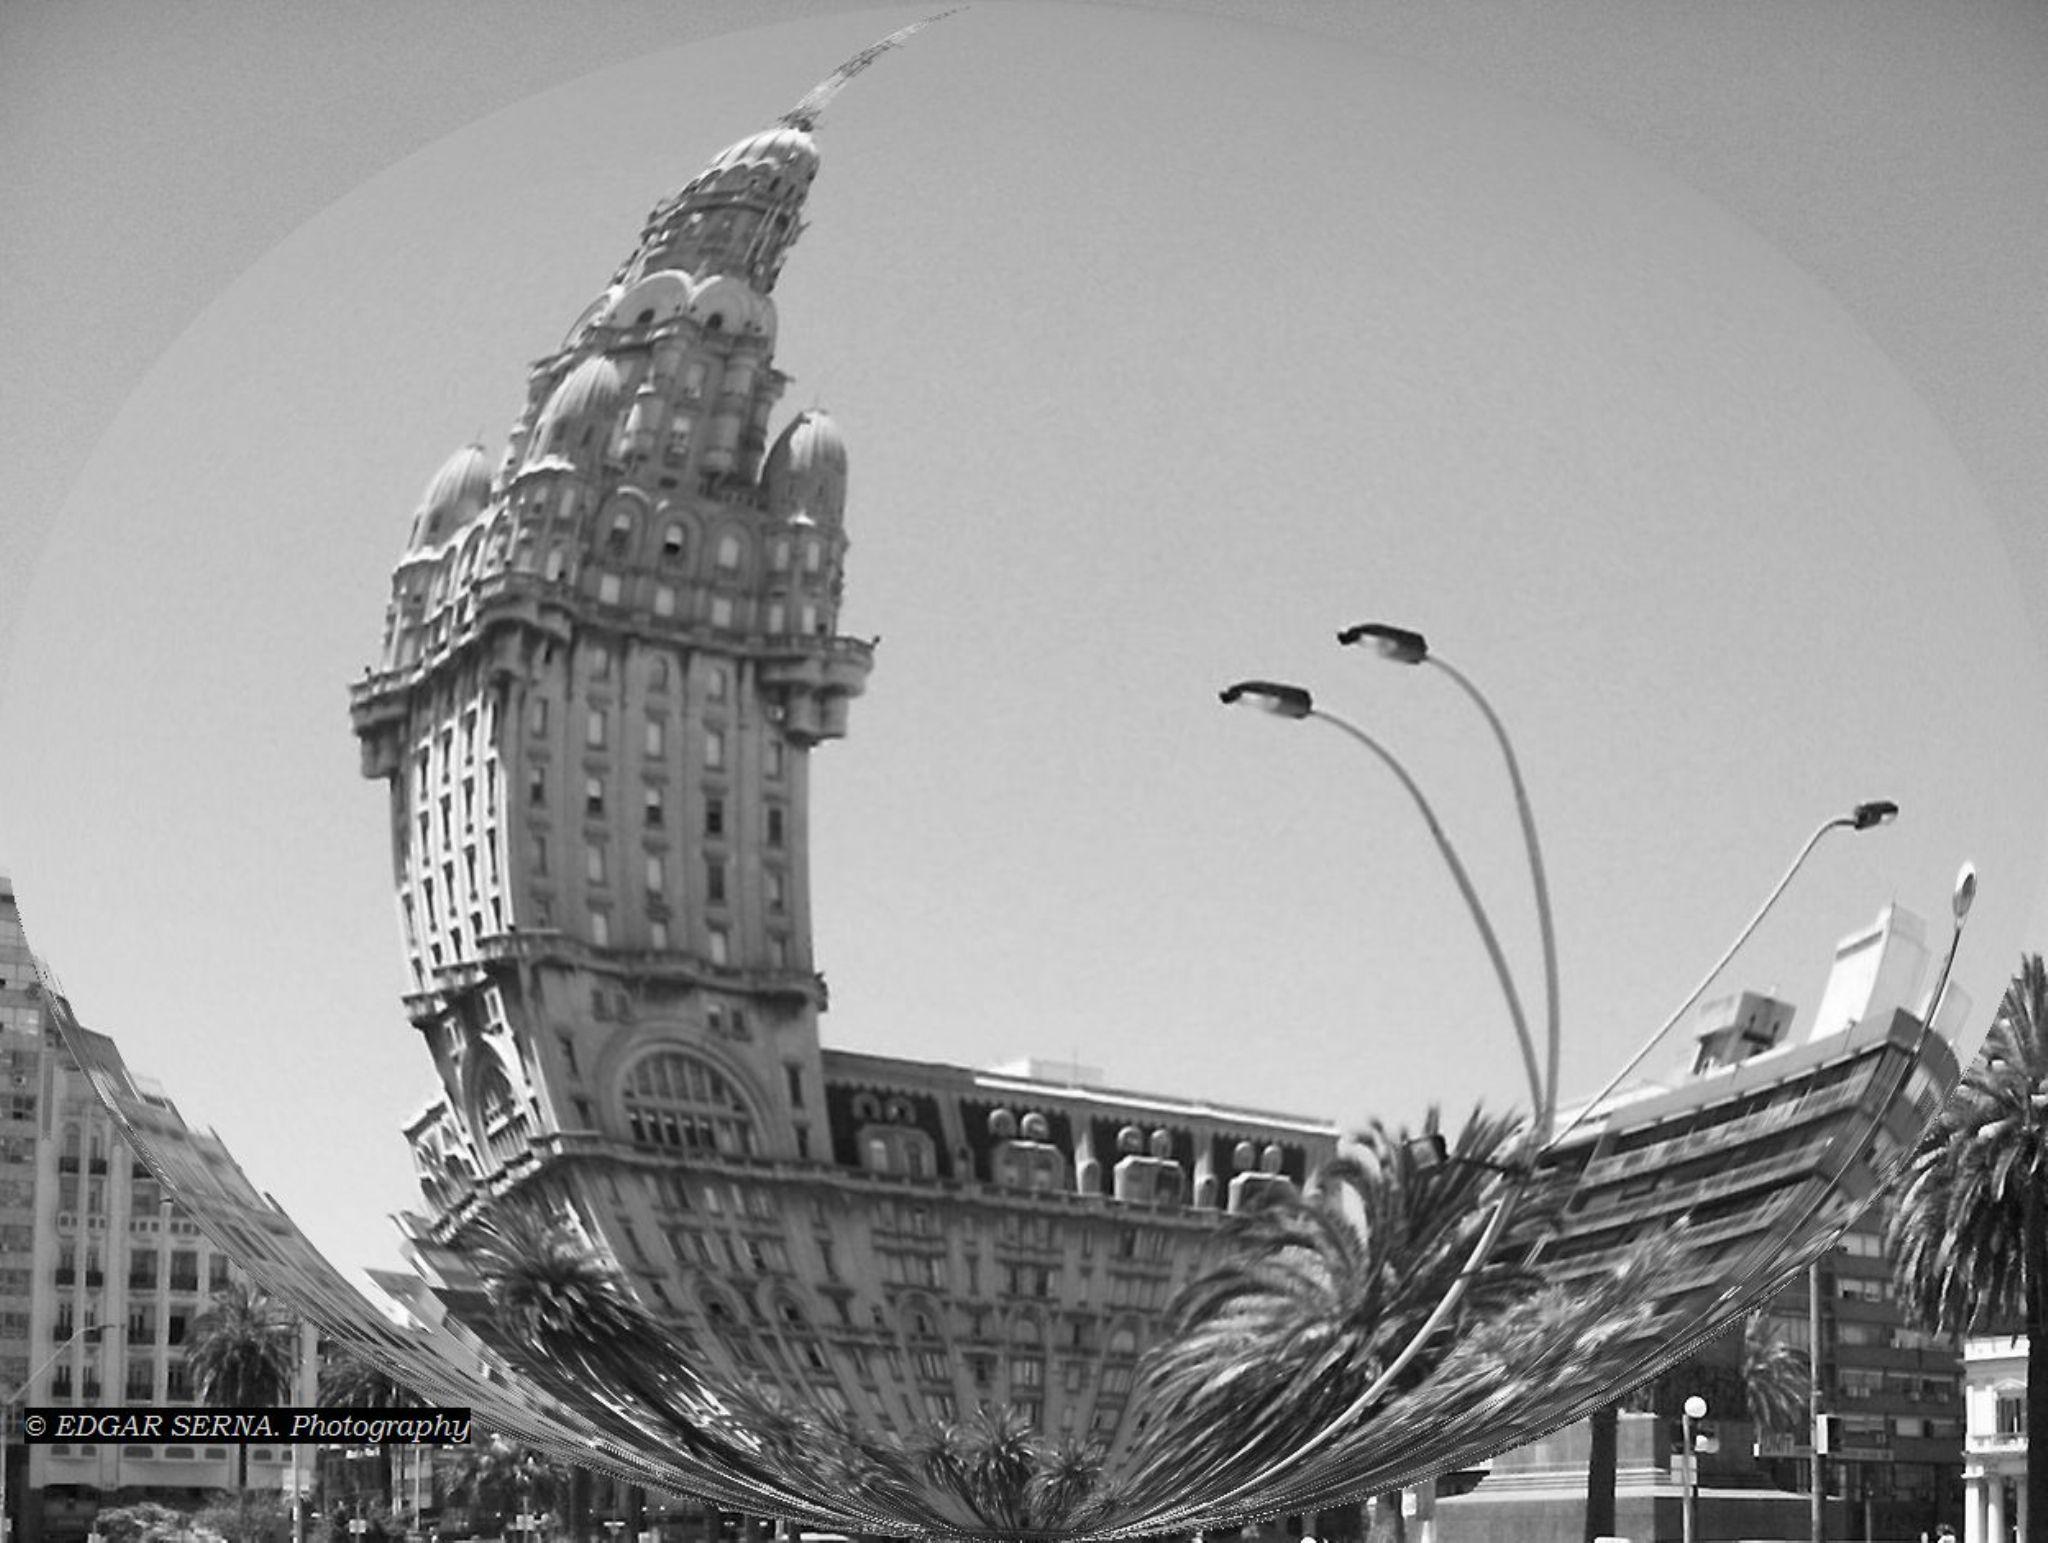 Montevideo by Edgar Serna